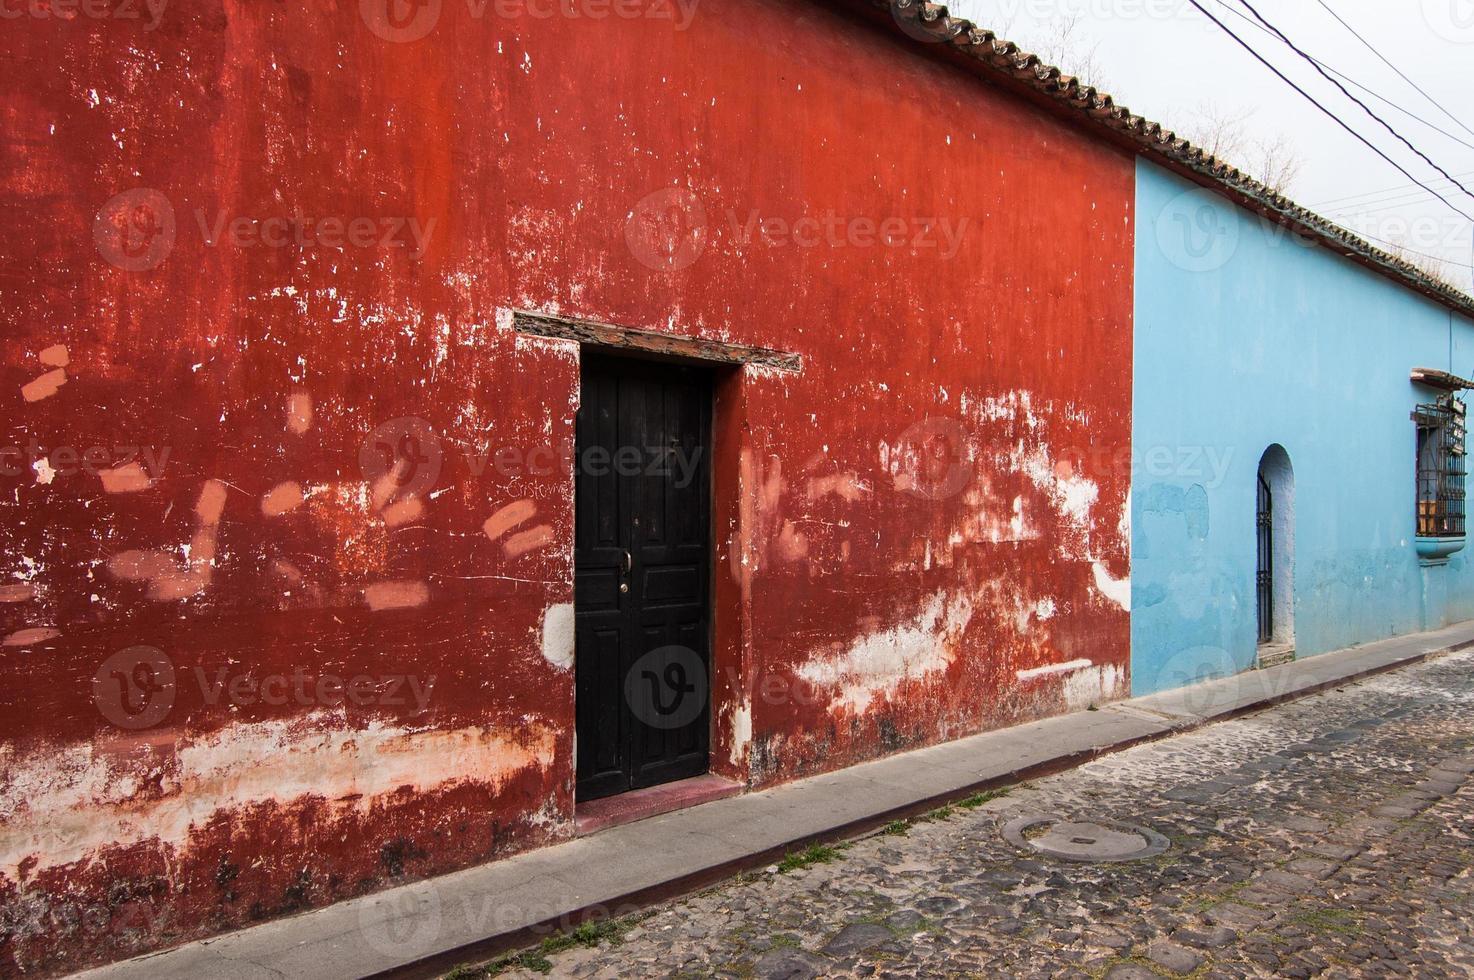 Casas pintadas de colores en Antigua, Guatemala foto